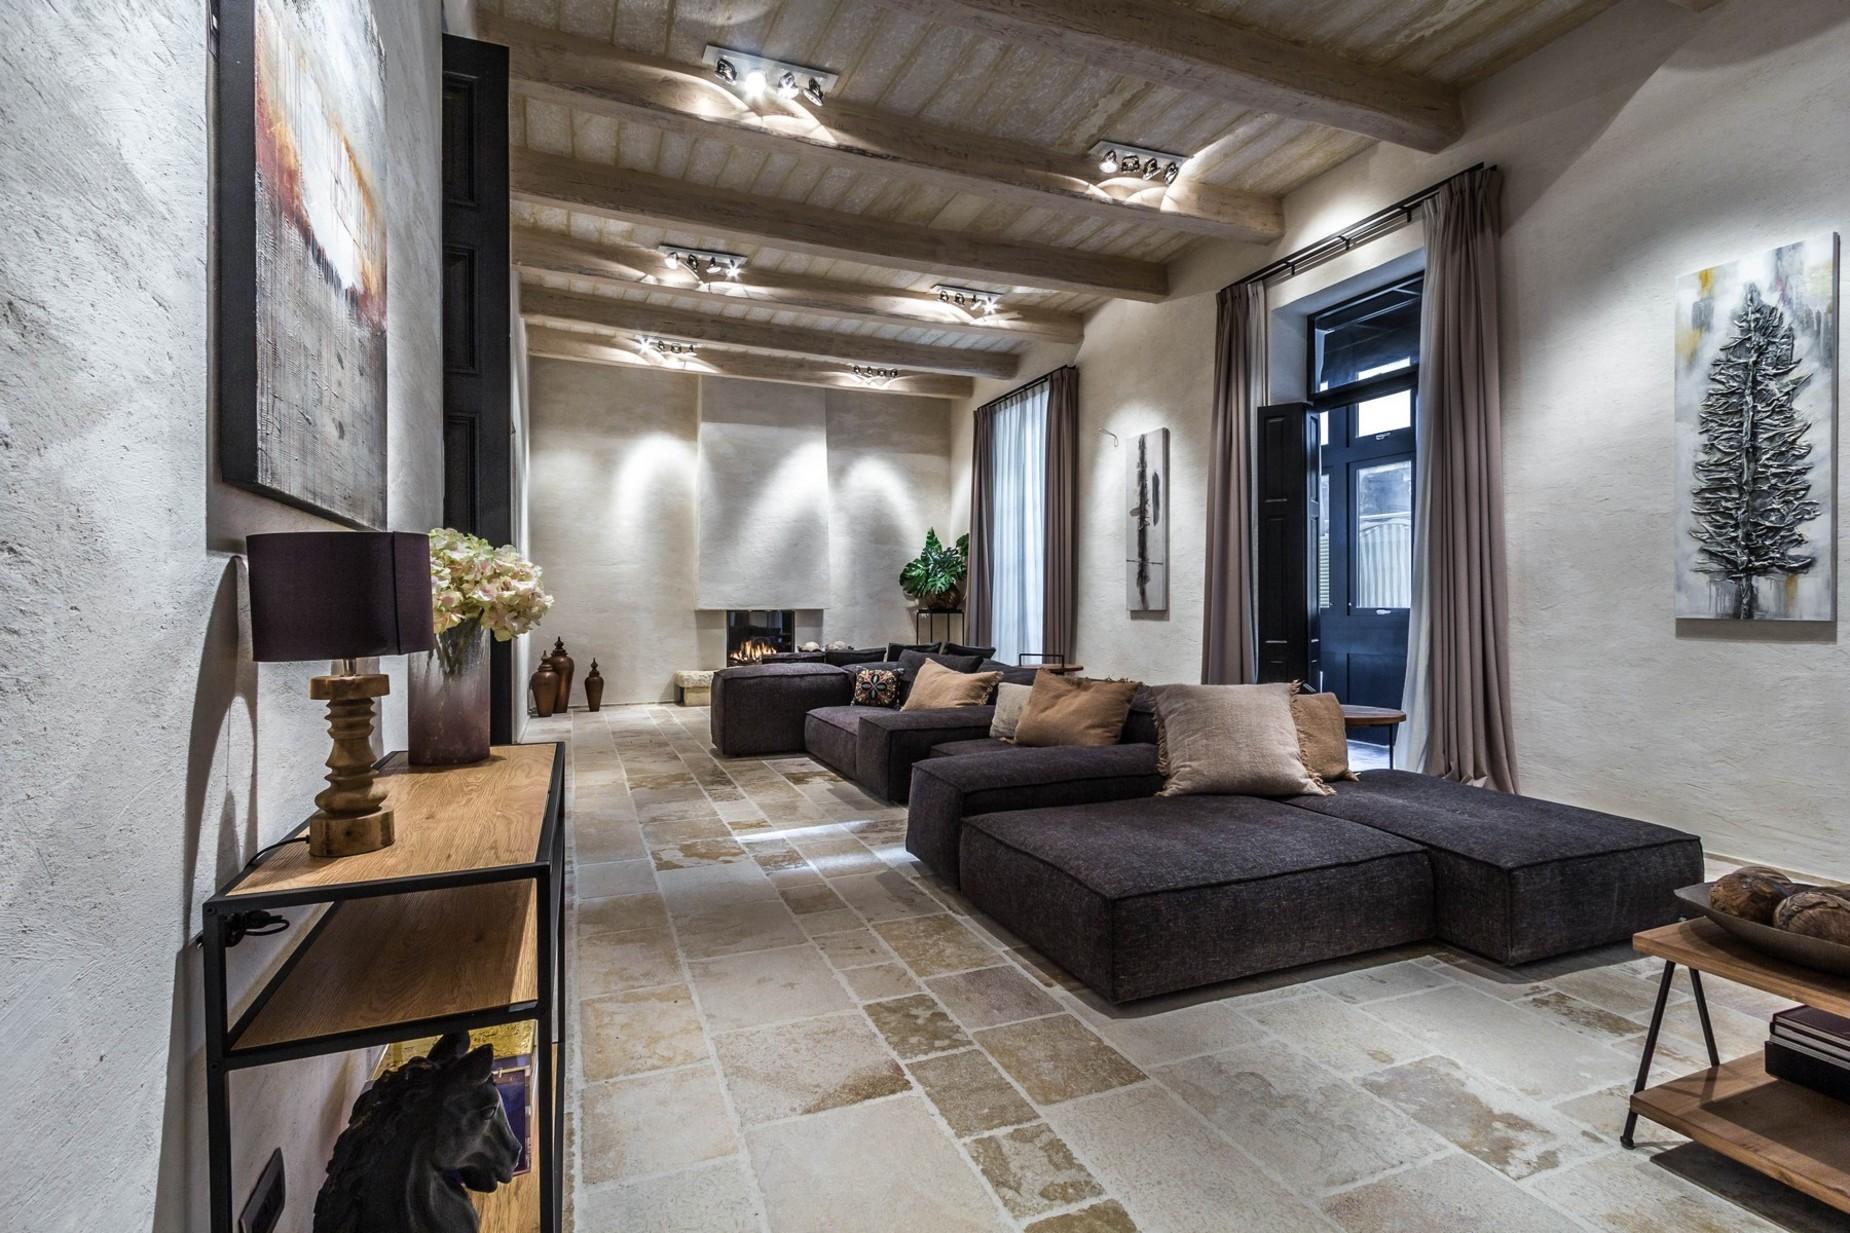 5 bed Palazzo For Sale in Vittoriosa, Vittoriosa - thumb 3